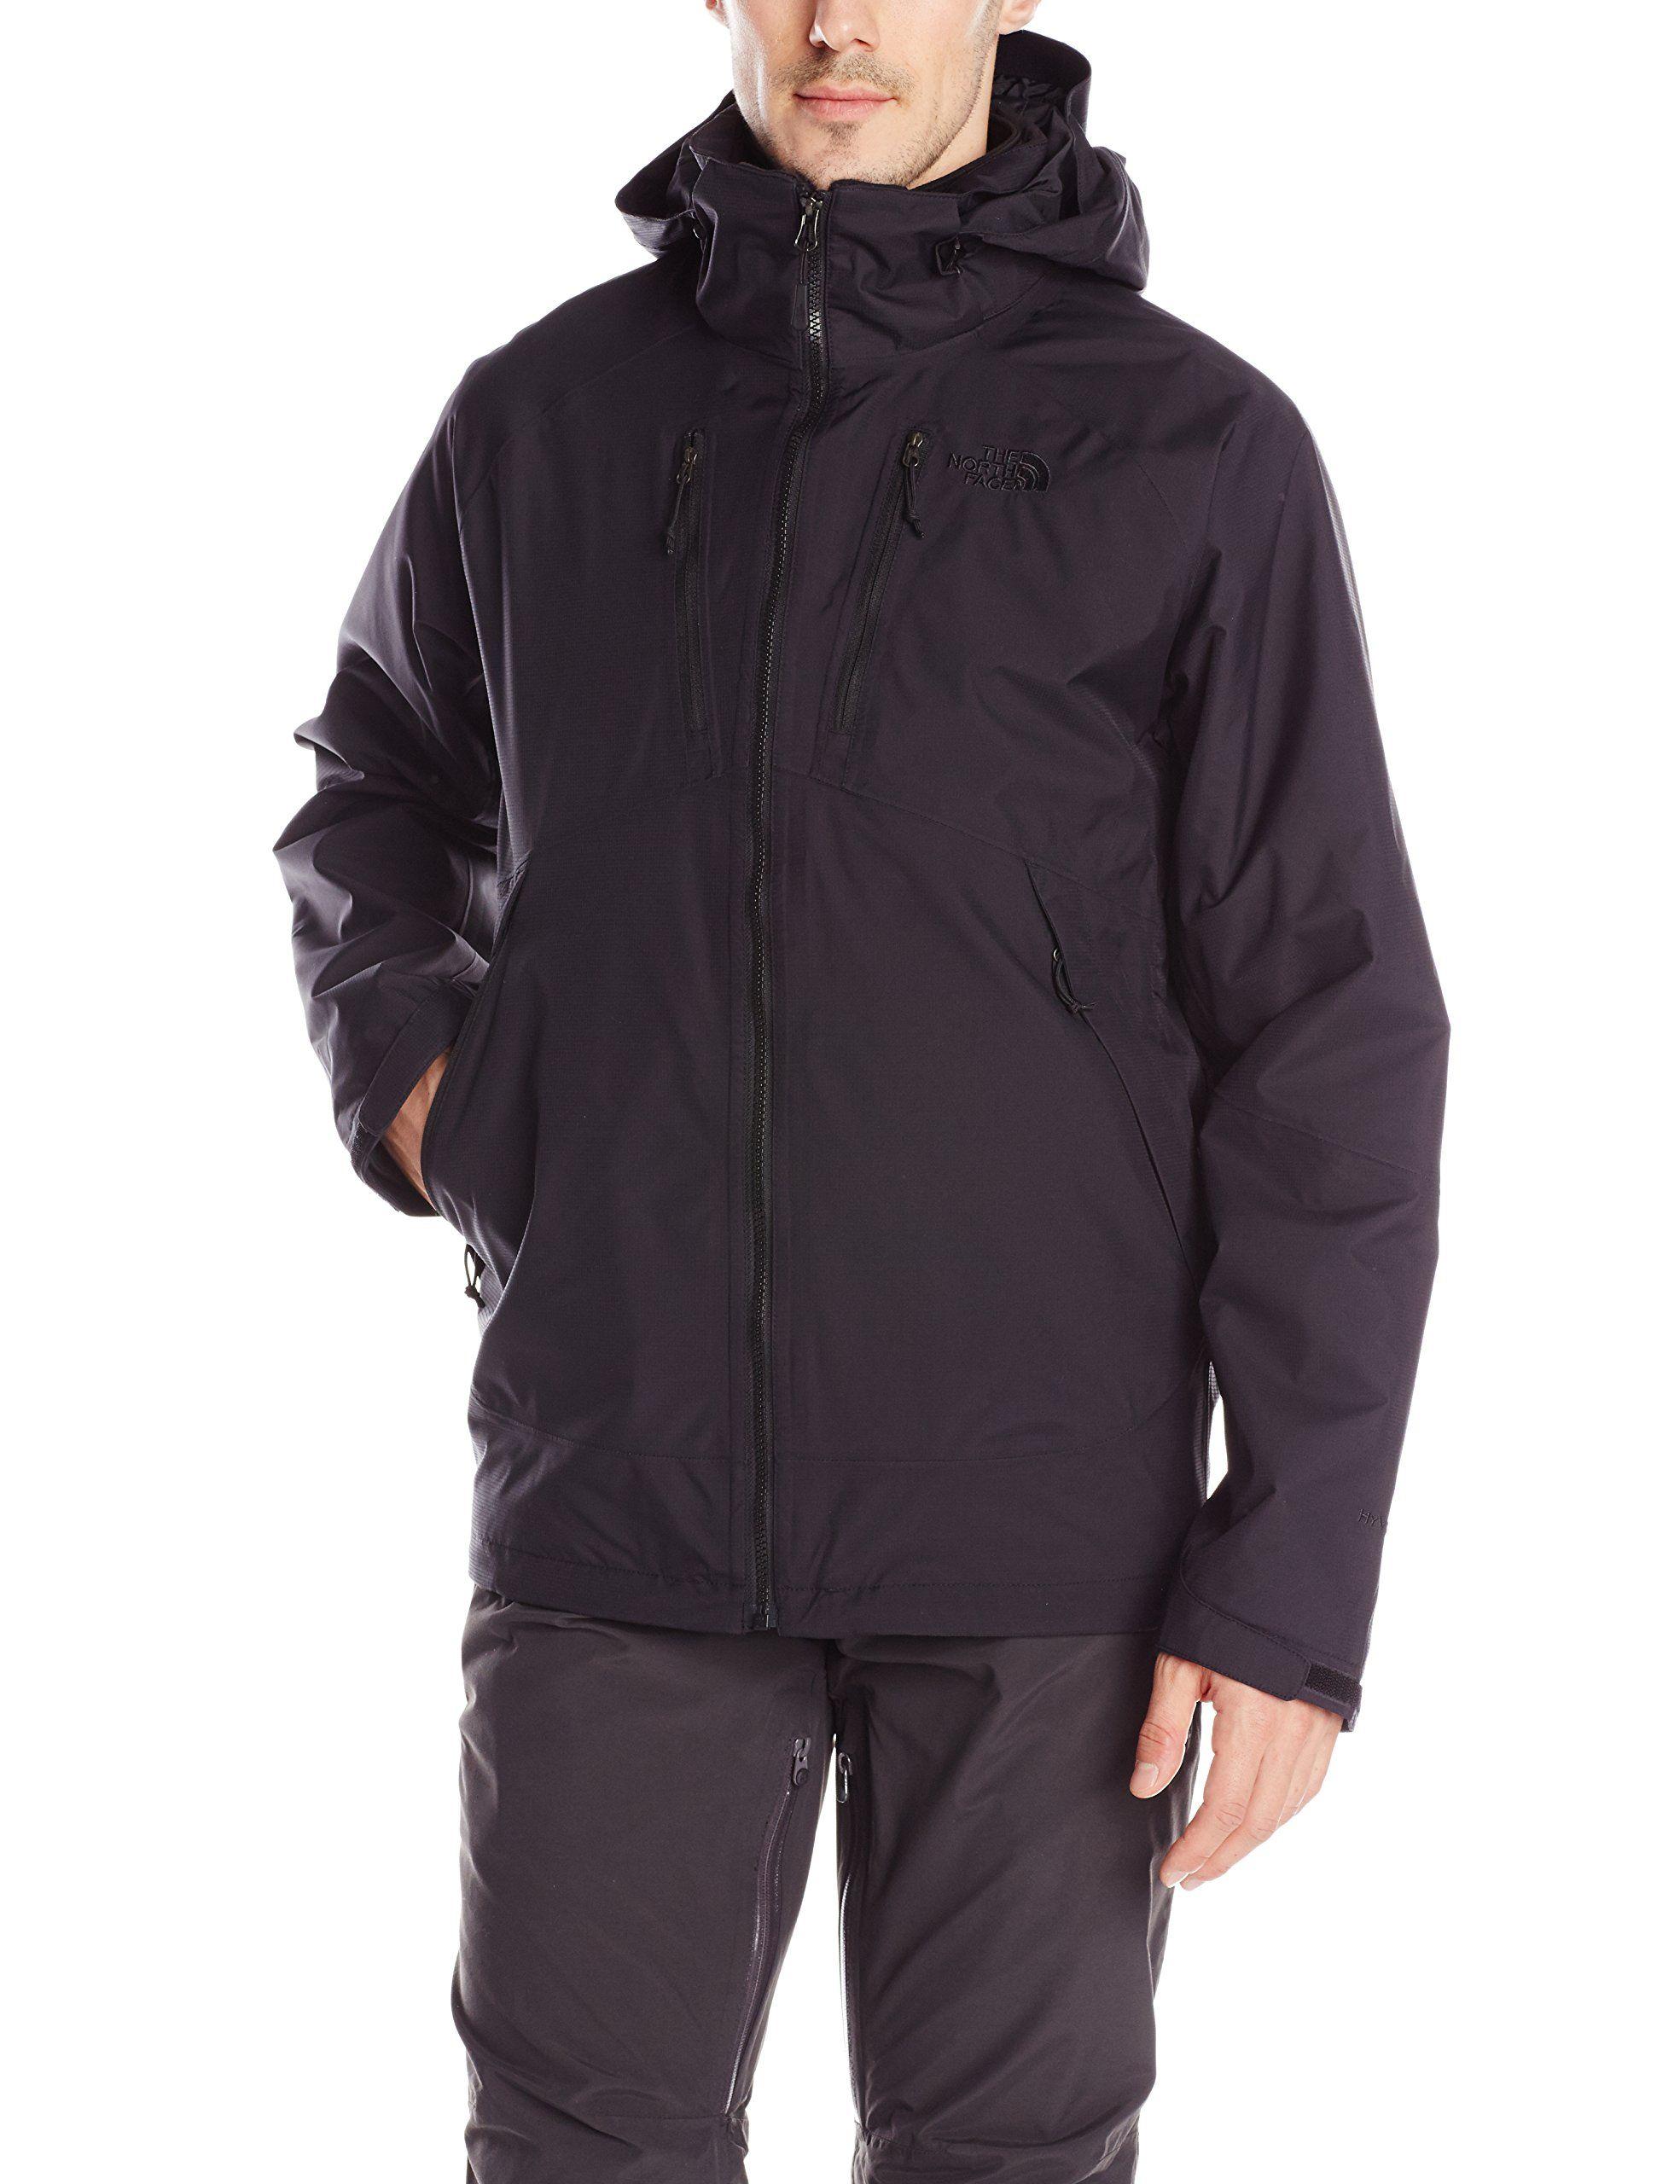 The North Face Condor Triclimate Jacket Mens TNF Black TNF Black S ... bc06d28fd